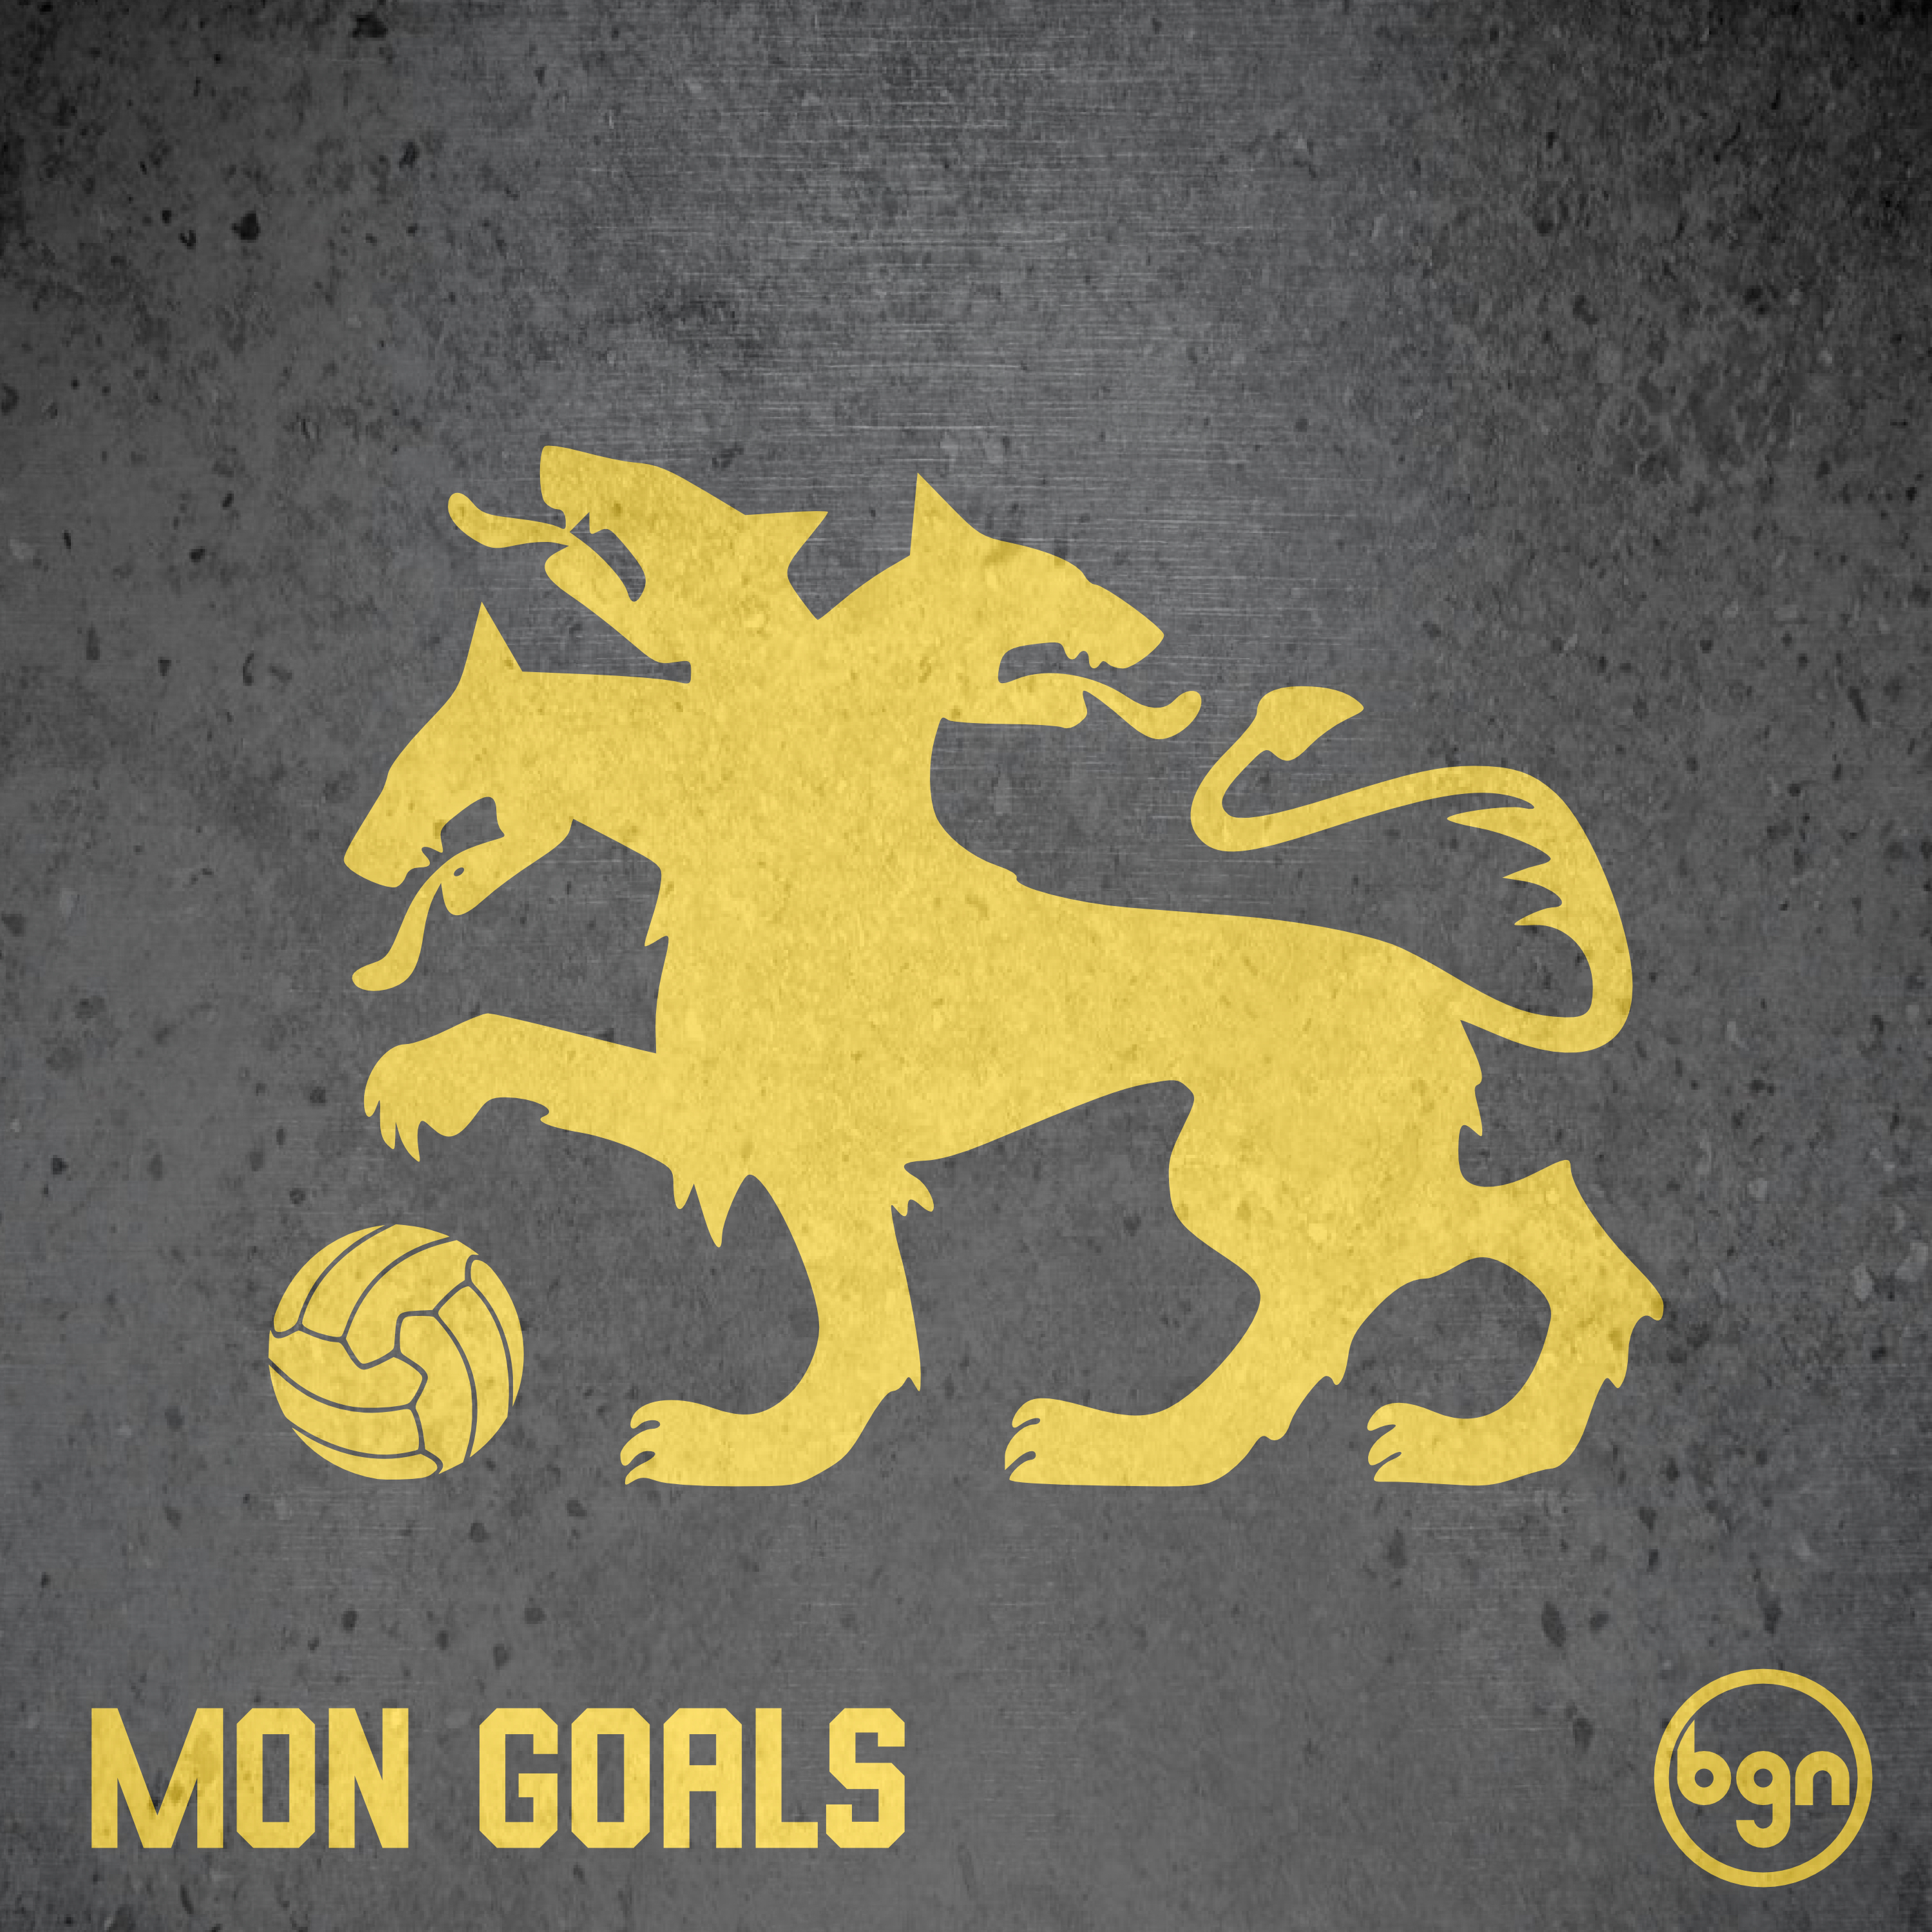 Mon Goals - redo